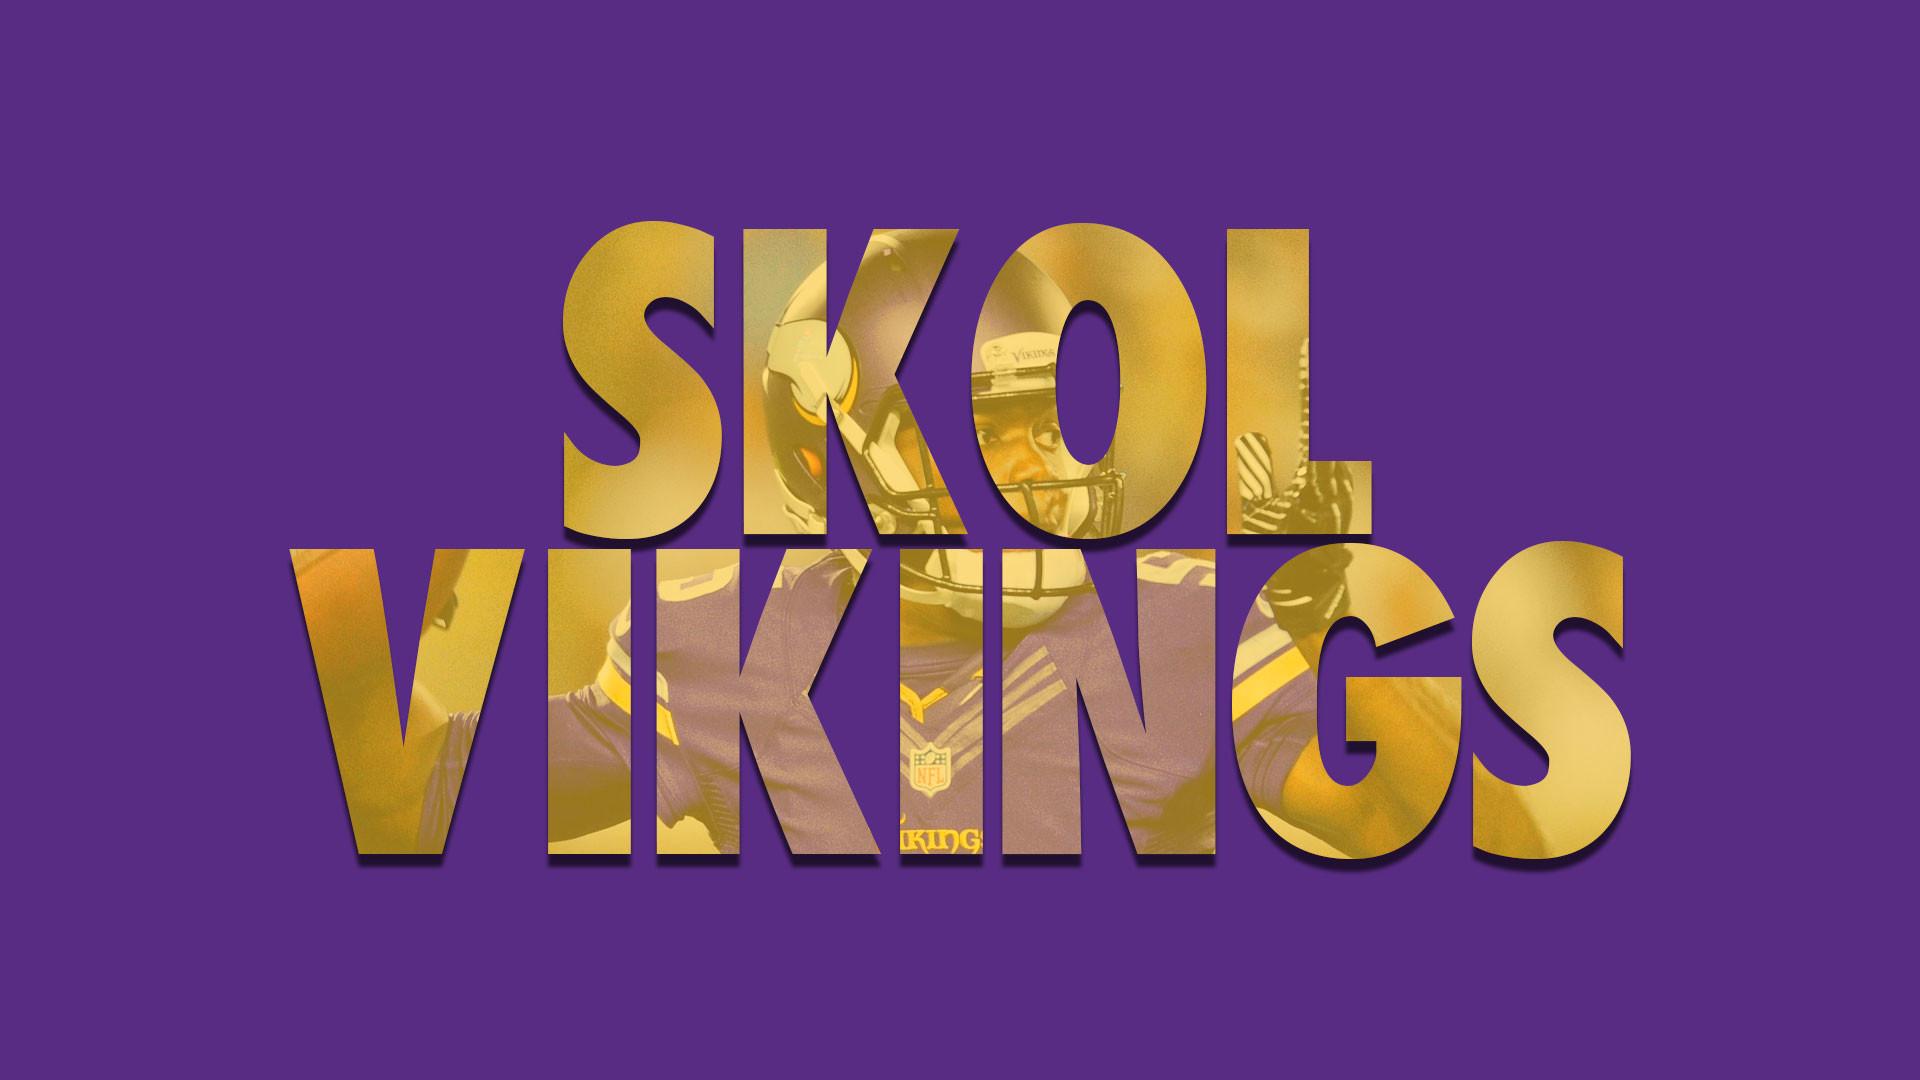 Minnesota Vikings Wallpaper Hd   Minnesota Vikings Skol Background 1920x1080